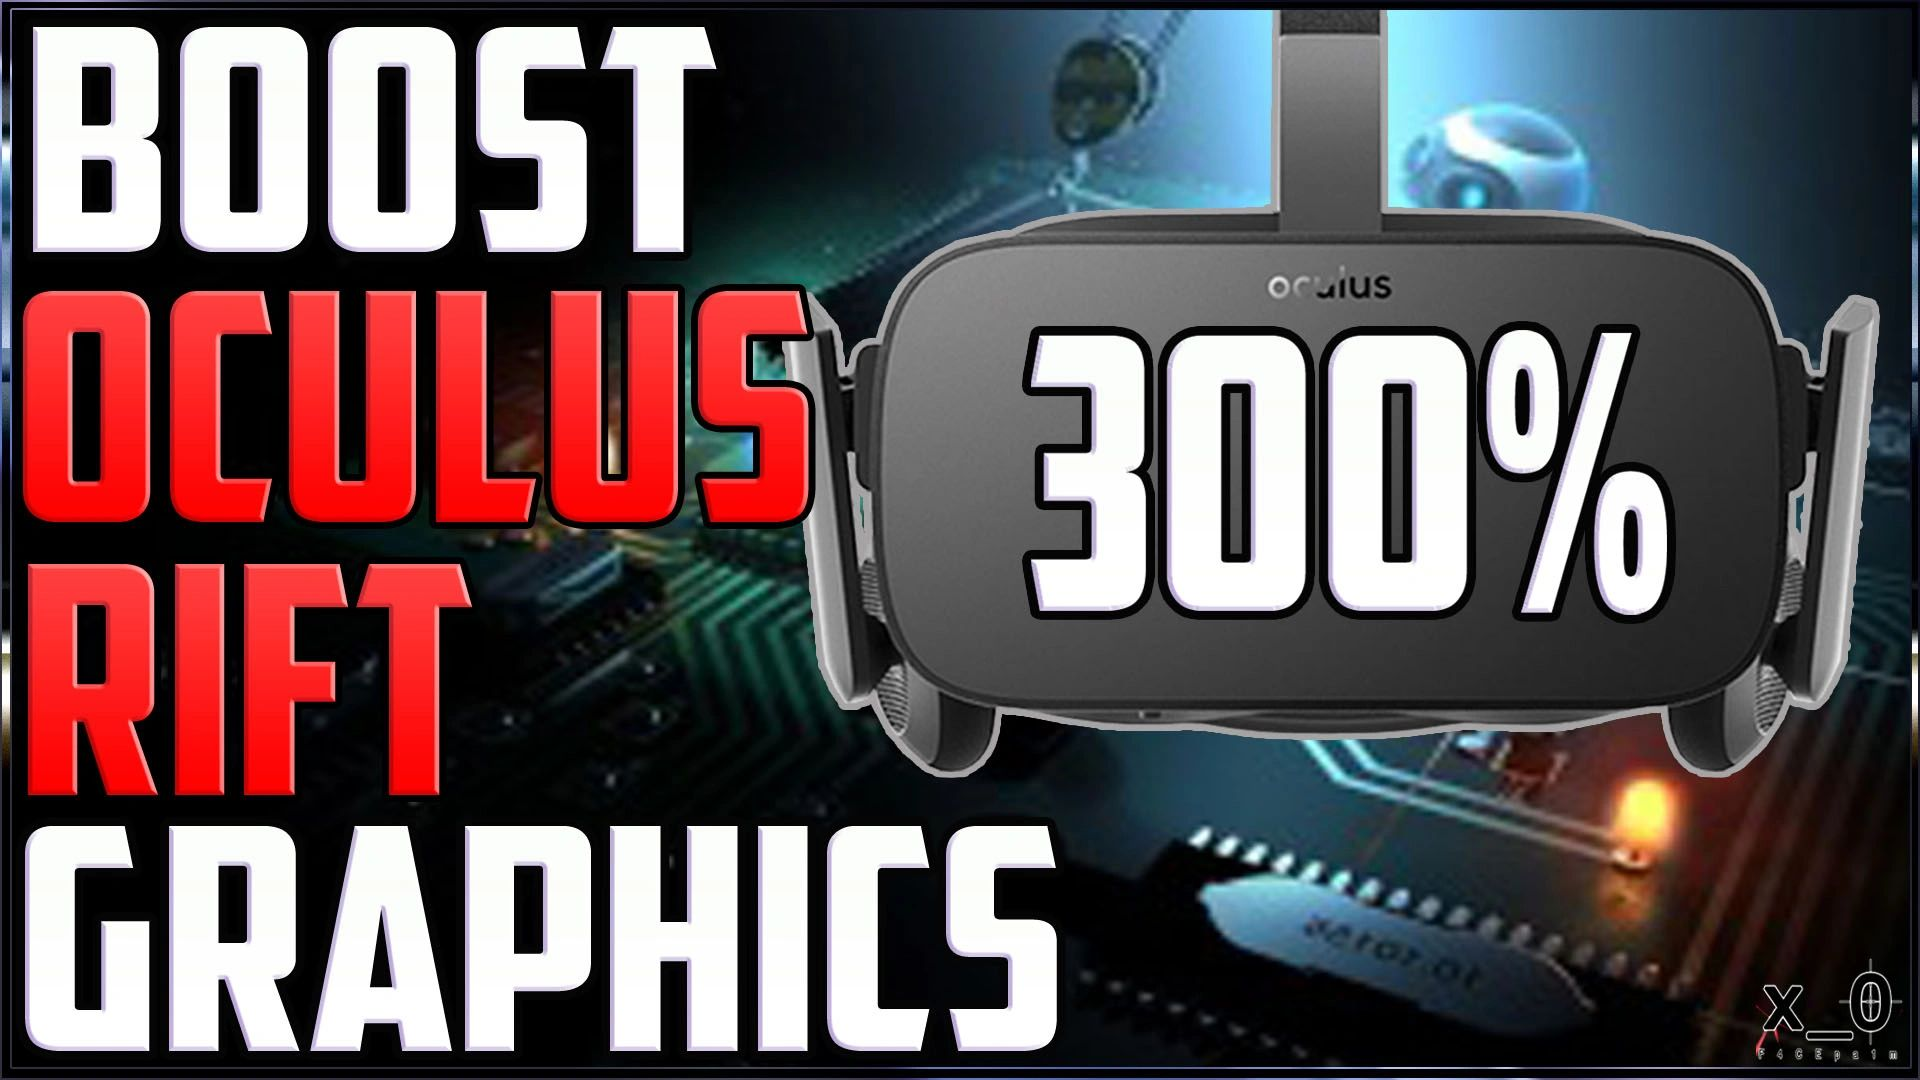 change where oculus installs games